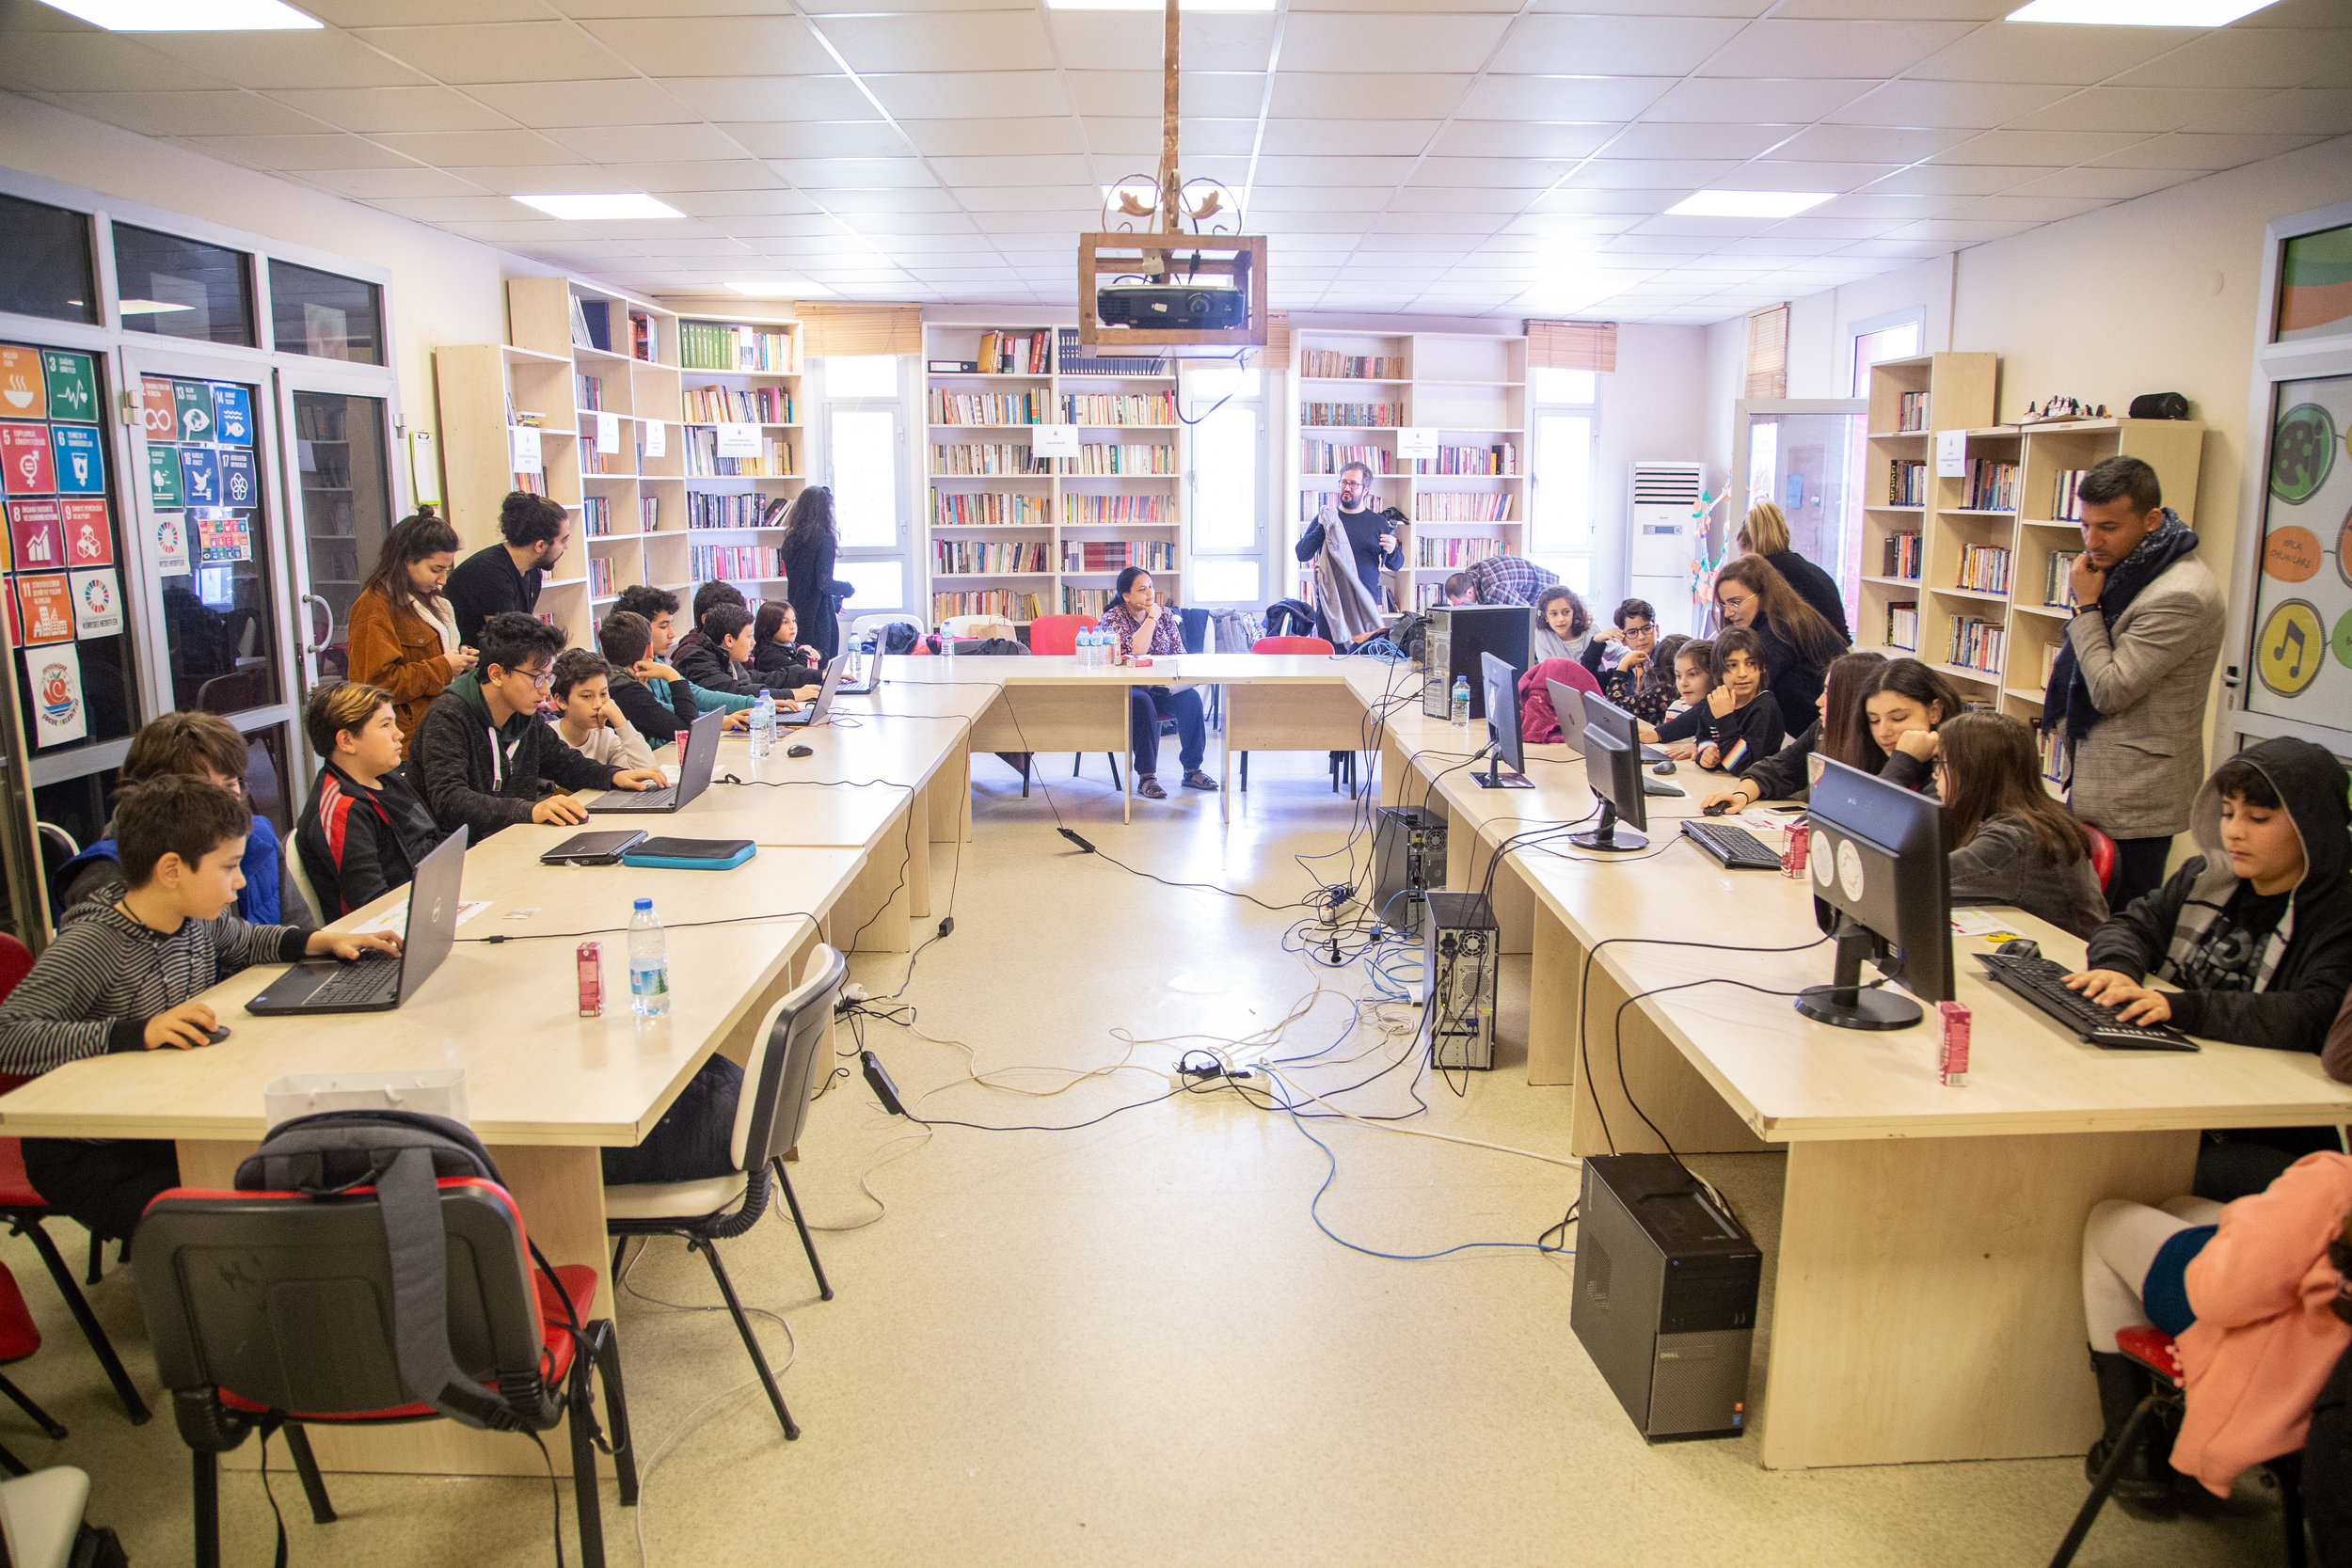 Creativity in action at the Seferihisar Block by Block Workshop. Credit: Abdullah Özden